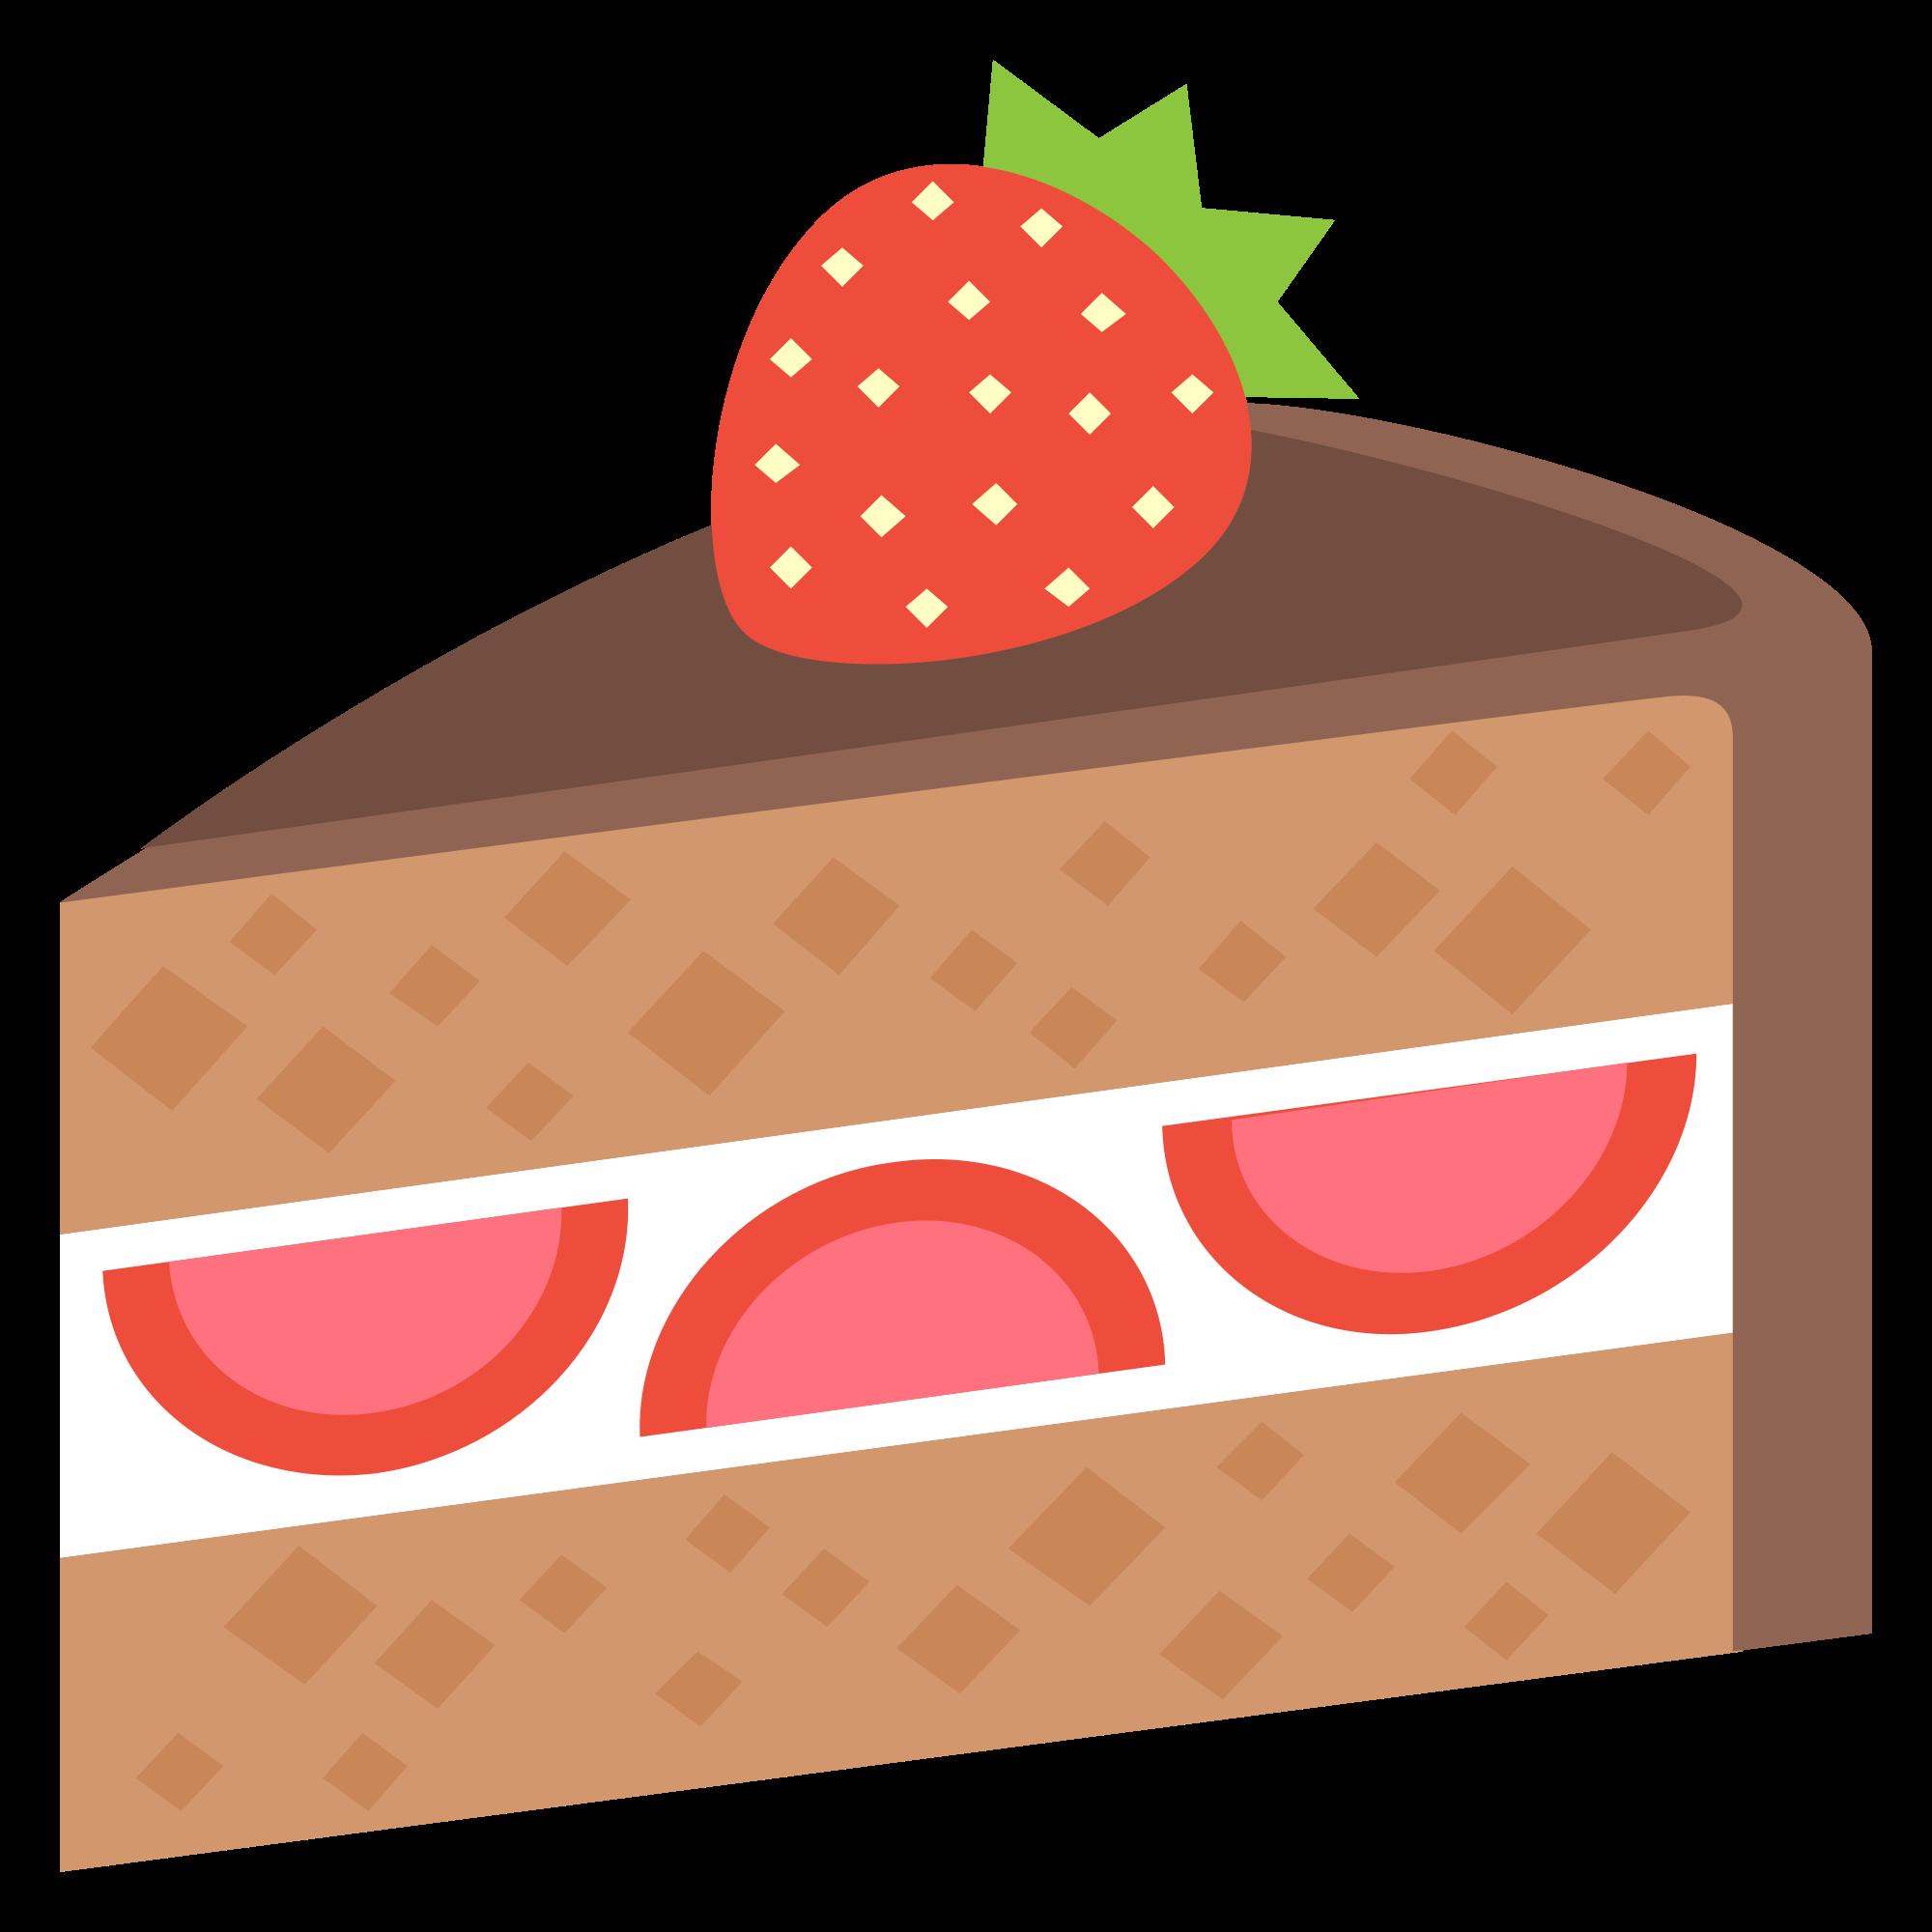 Strawberries clipart emoji. File emojione f svg